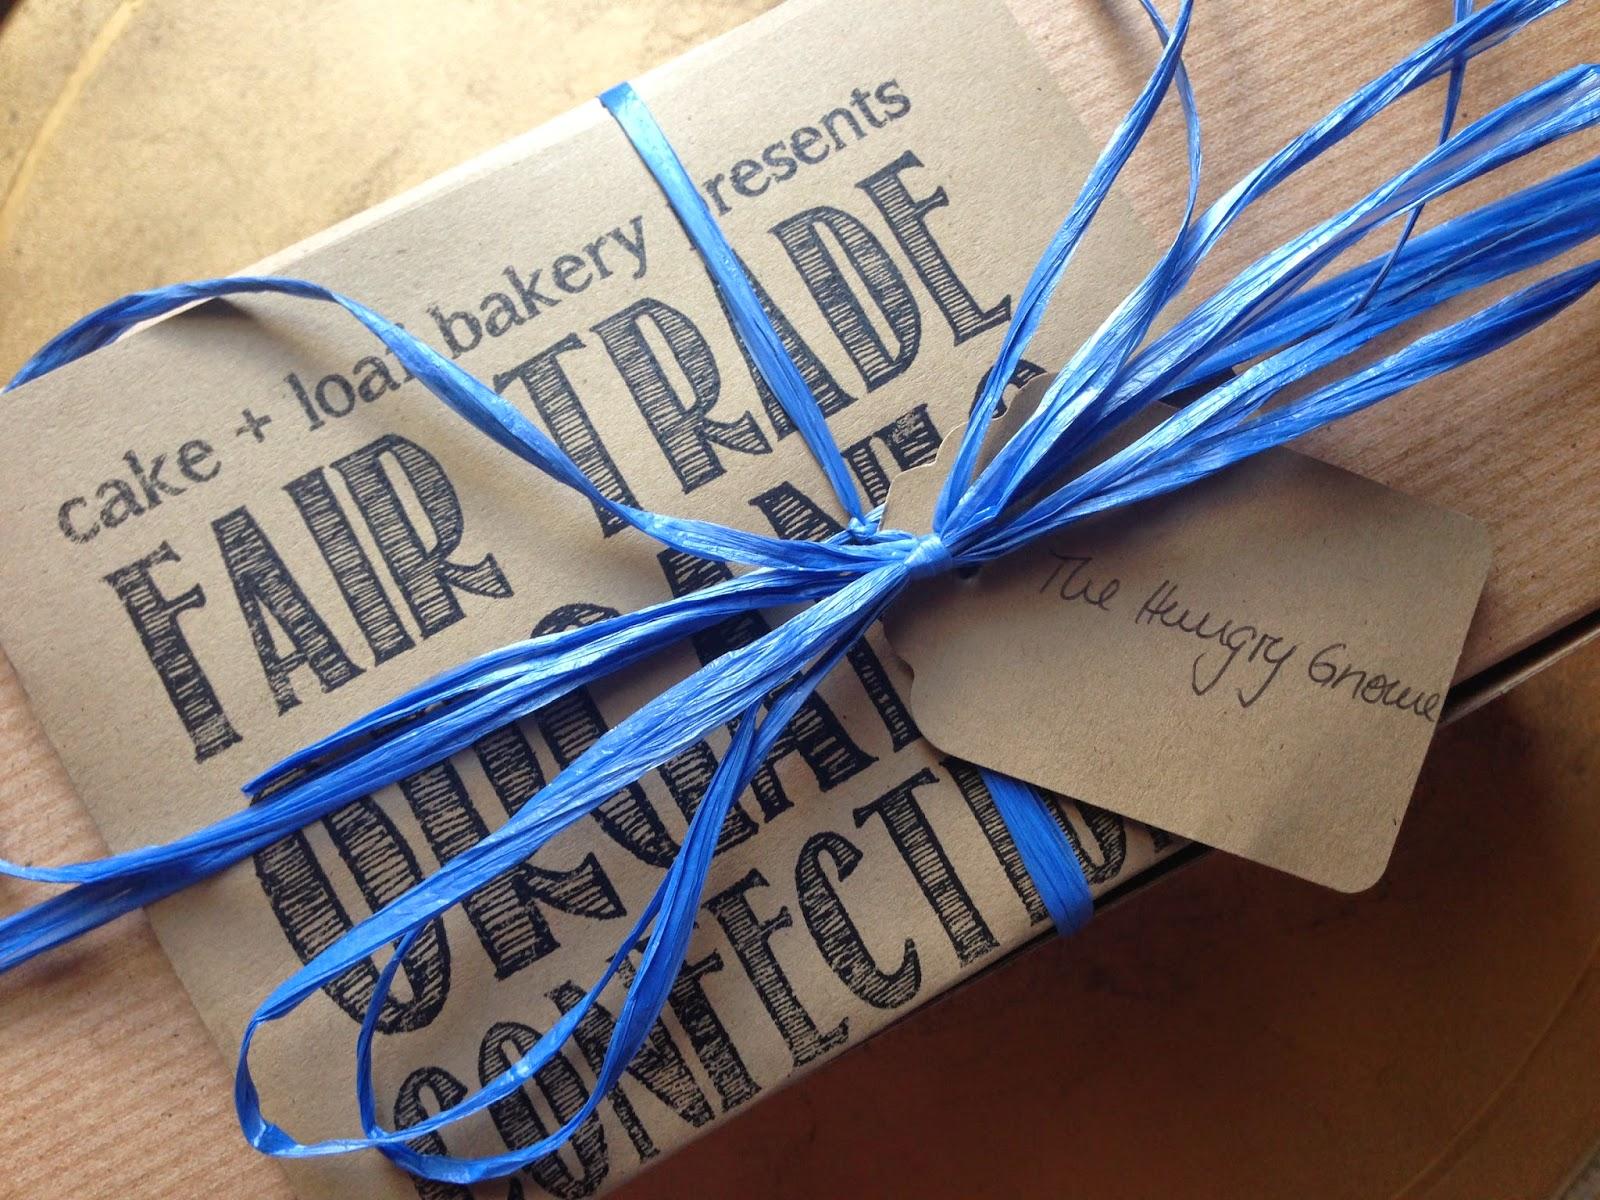 Cake Loaf's Fair Trade